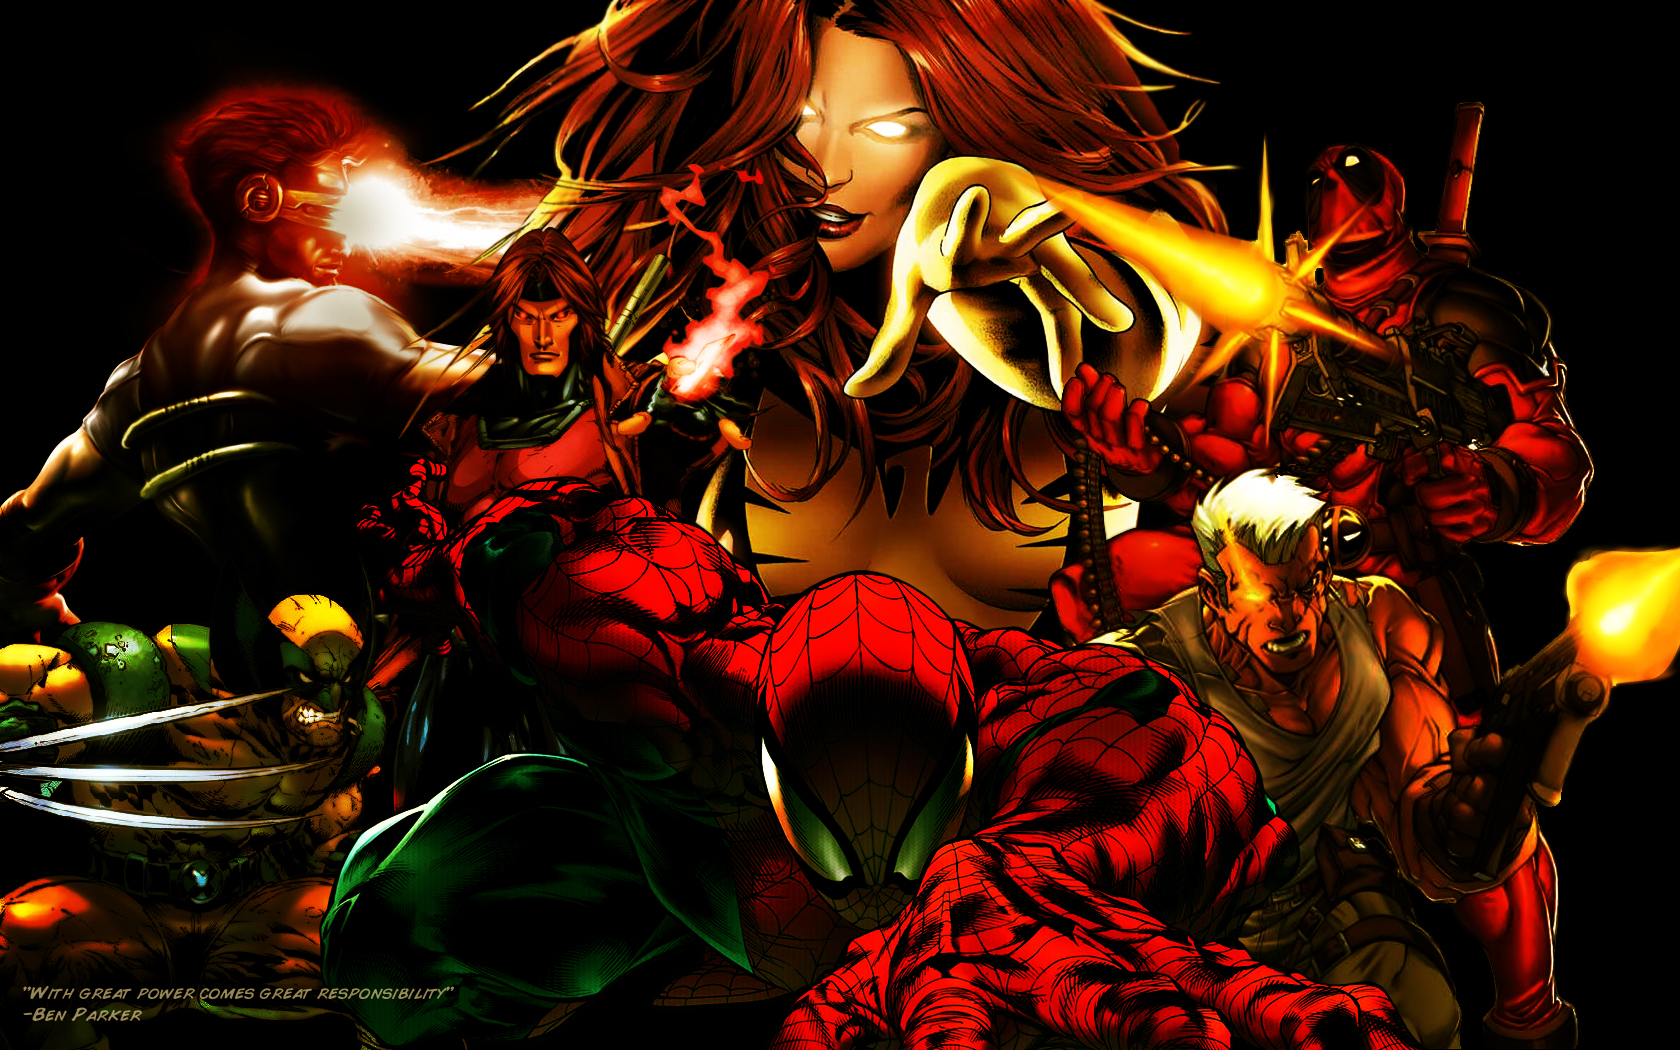 Superhero Wallpaper by OriJuice 1680x1050